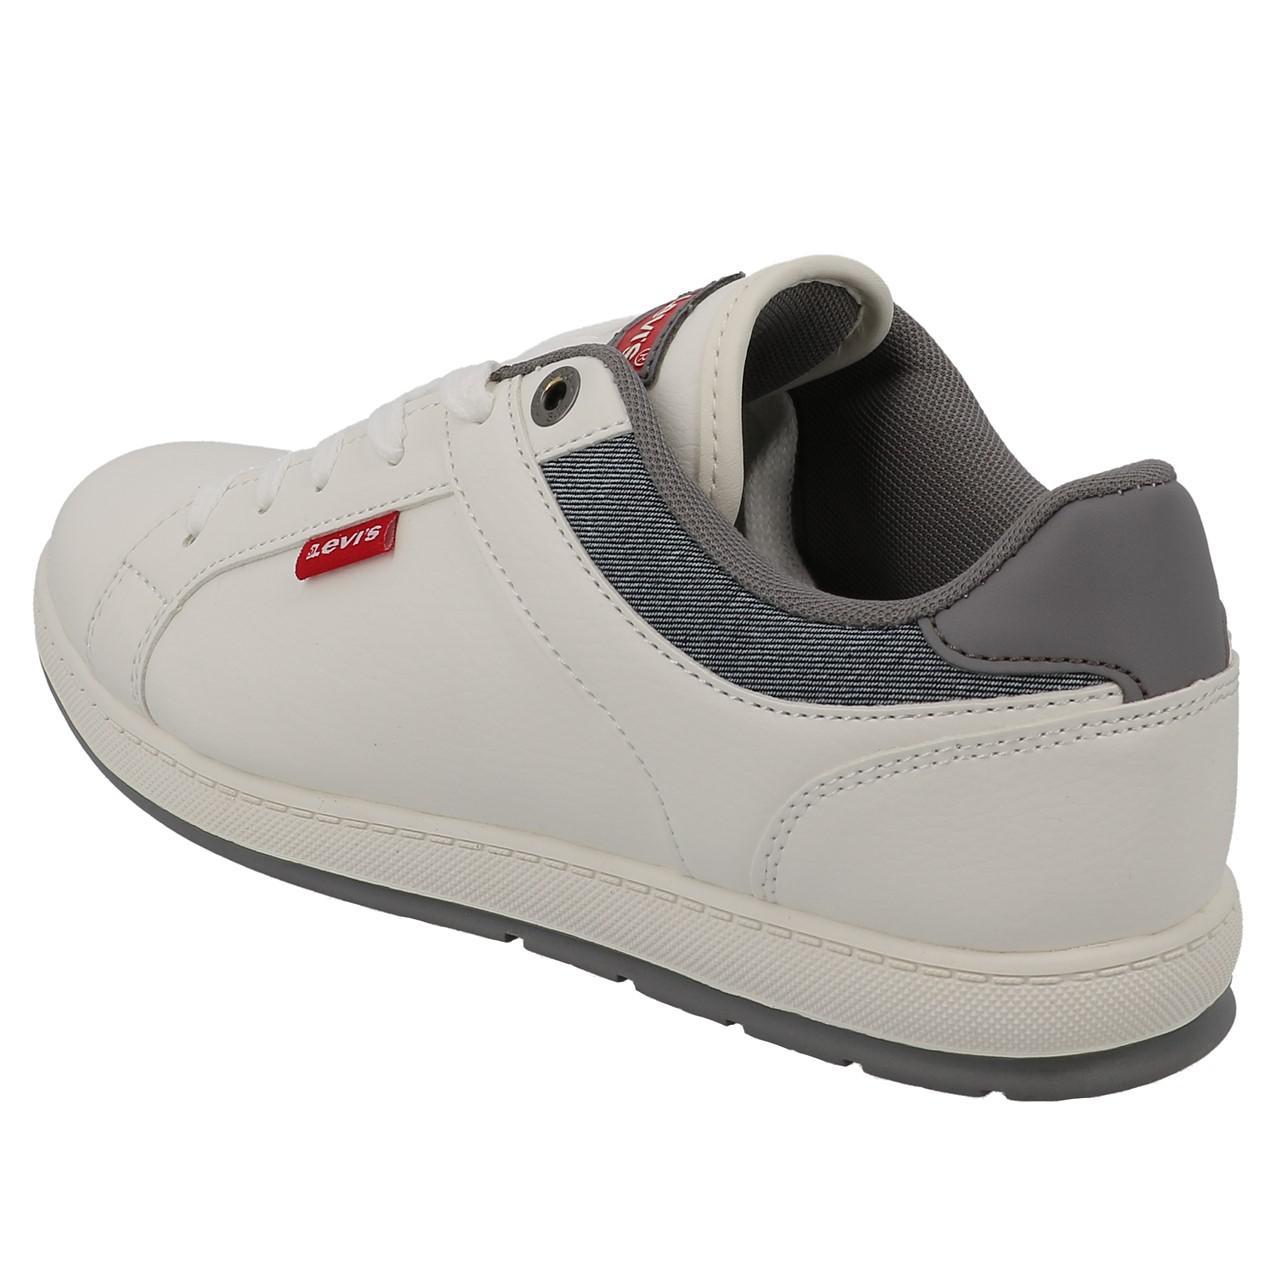 Chaussures-mode-ville-Levis-Declan-blanc-Blanc-53197-Neuf miniature 3